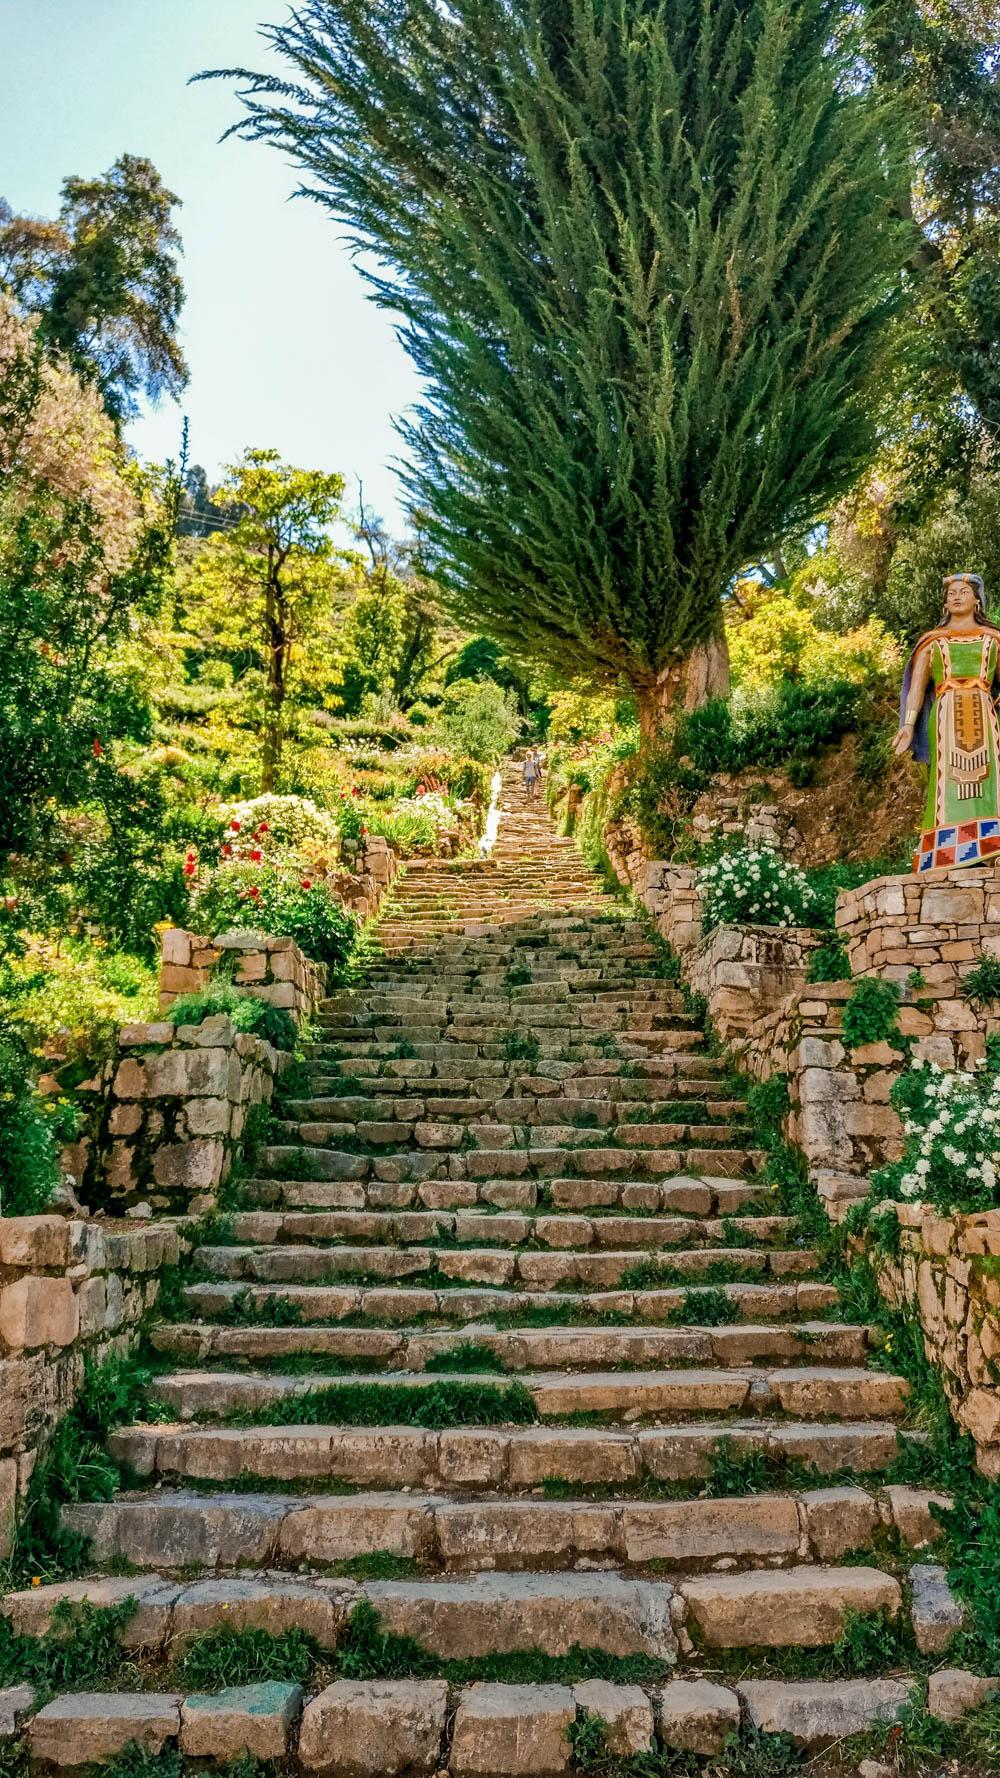 Yumani Inca steps - A day trip to Isla del Sol, Bolivia | Aliz's Wonderland